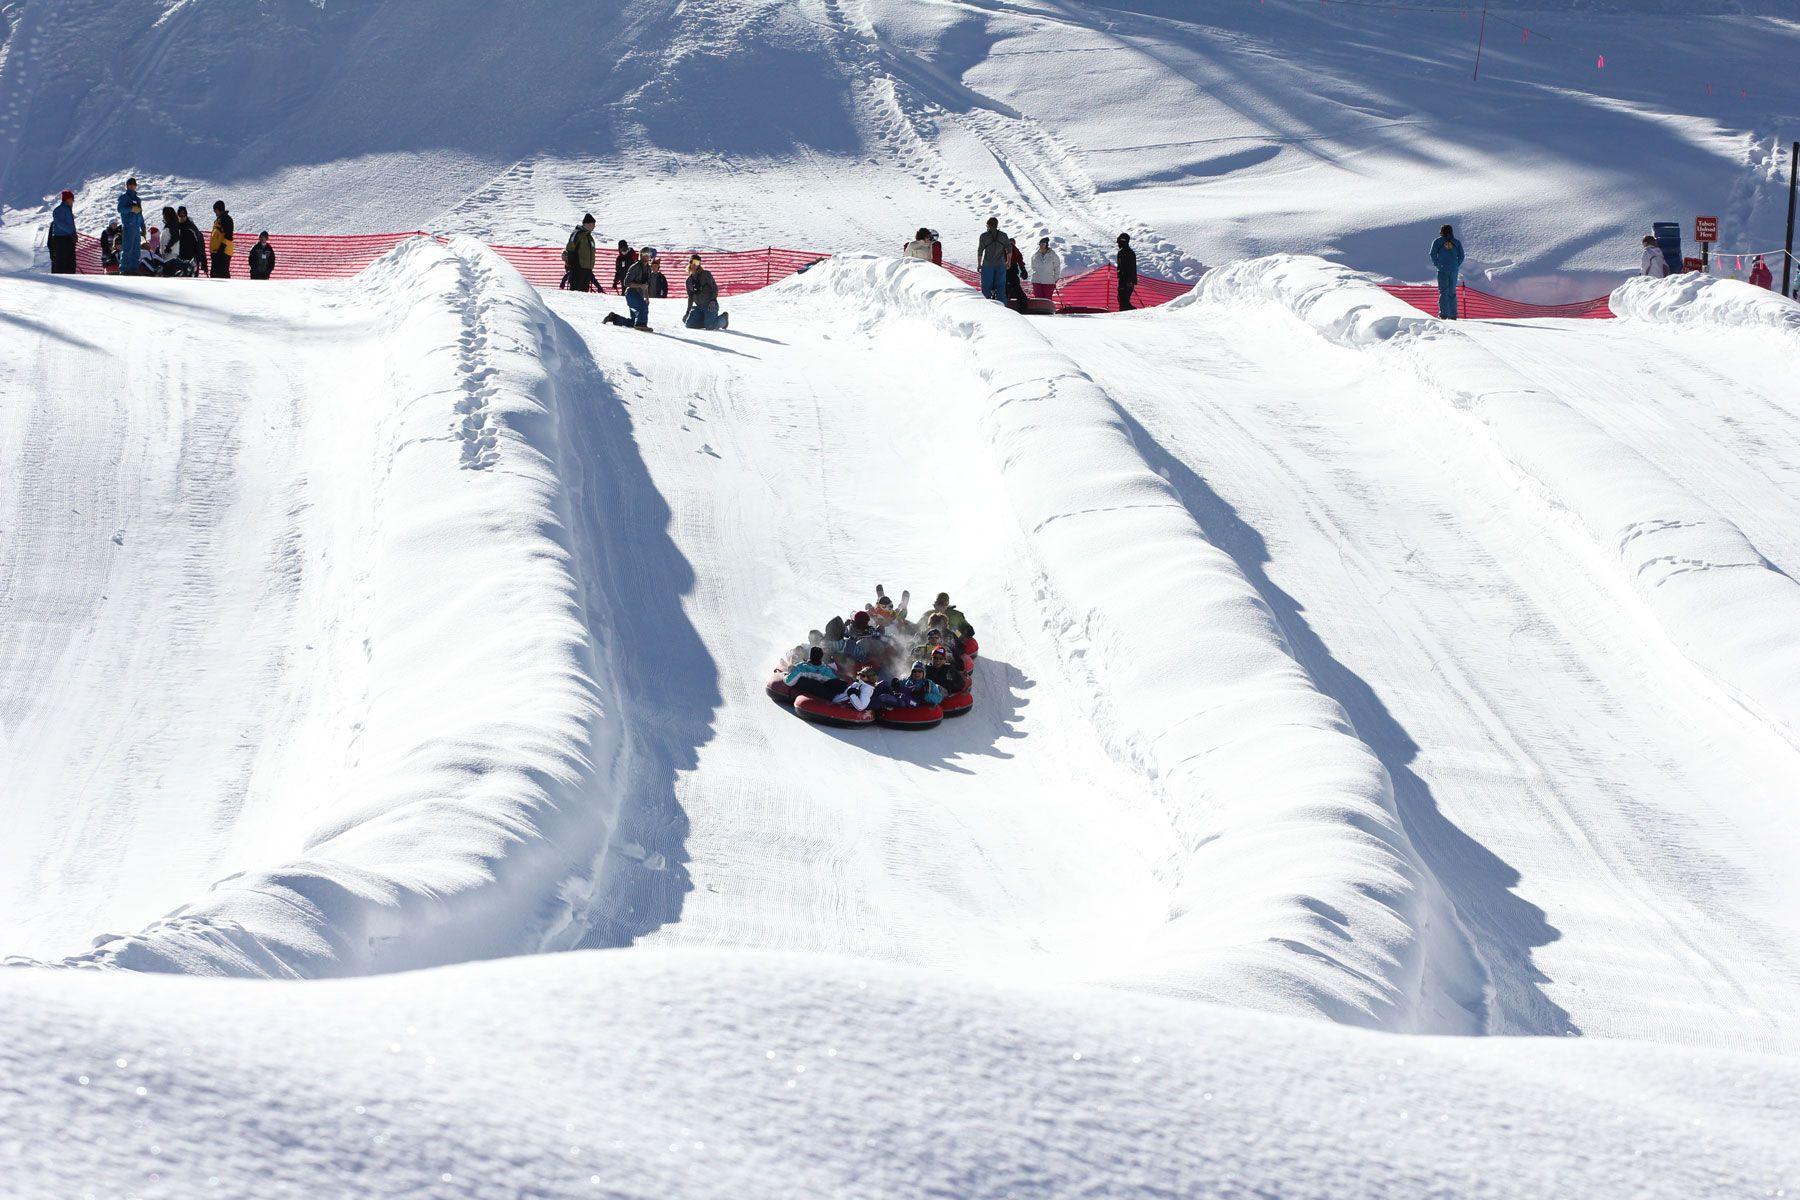 2 colorado sledding hills among nations best colorado